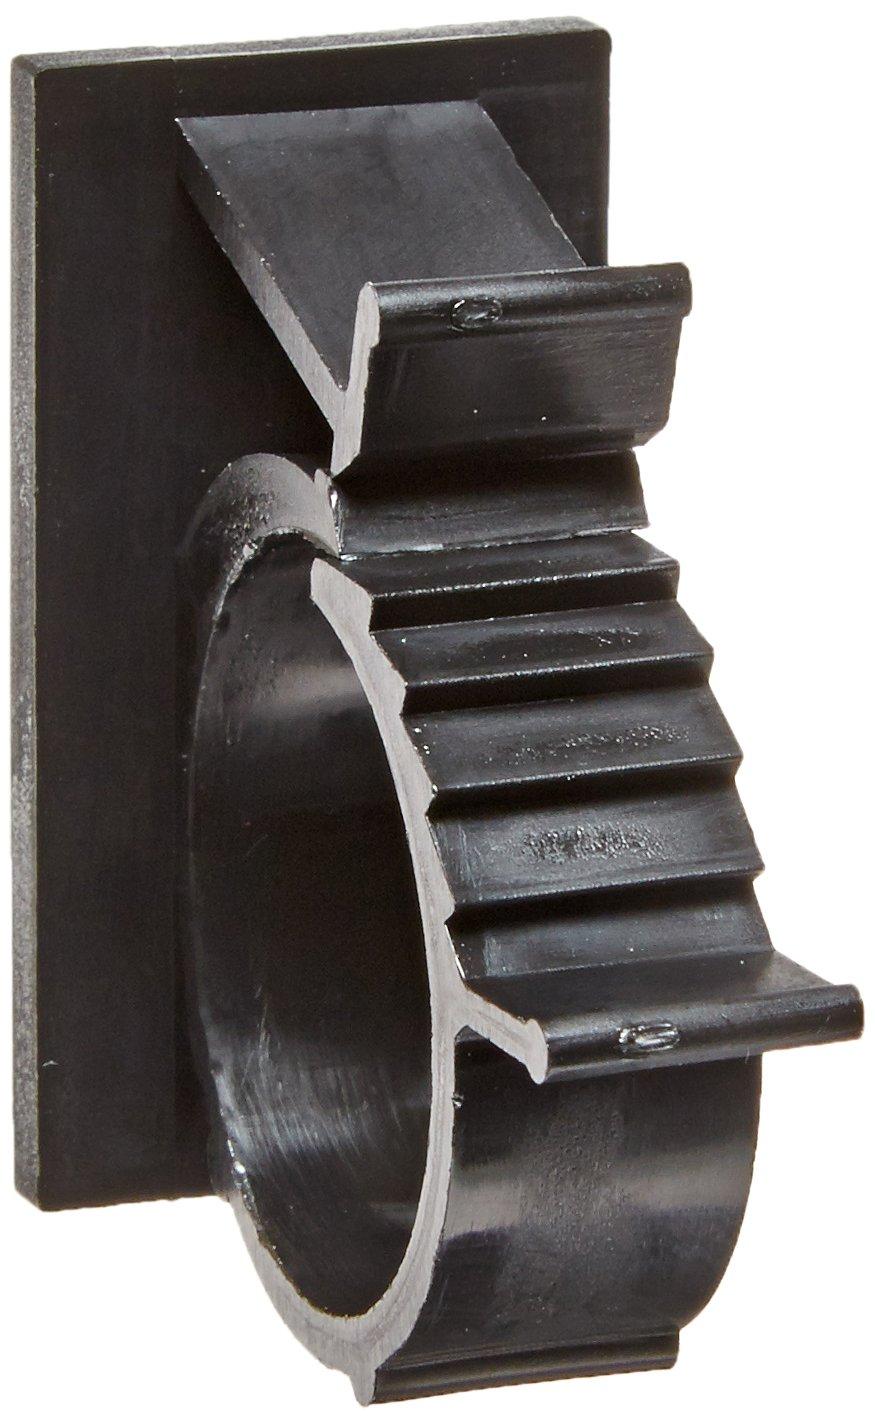 22-29//32 Width x 1-9//16 Height x 17-3//4 Depth Smooth Black Finish 22-29//32 Width x 1-9//16 Height x 17-3//4 Depth BUD Industries SH-2480 Steel Non-Ventilated Stationary Shelf